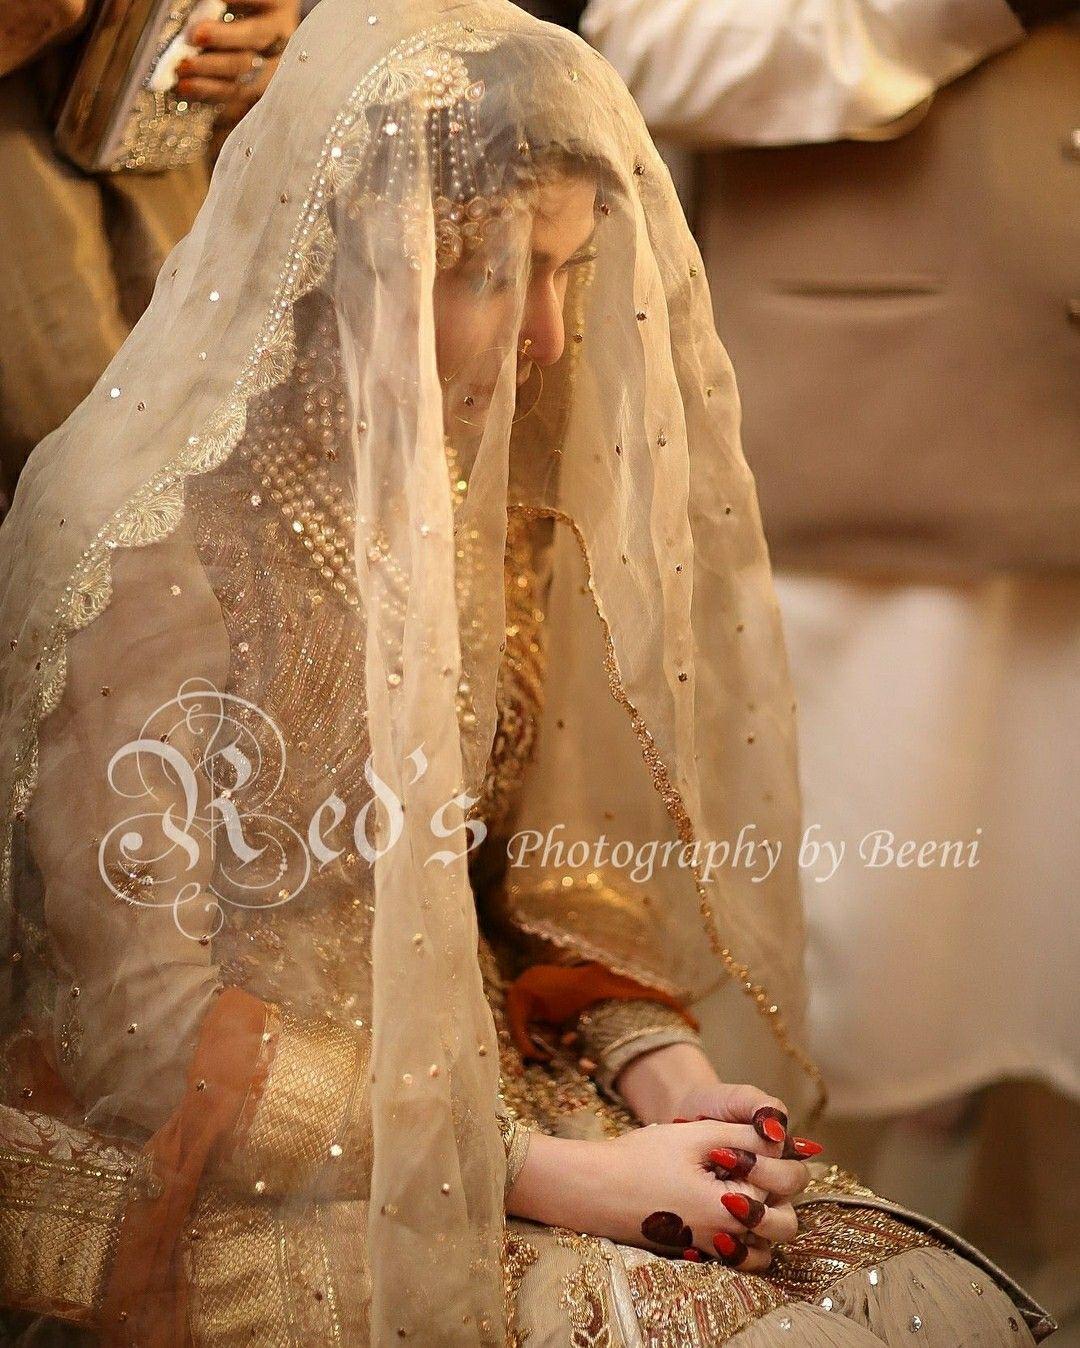 Hassanツ bridle dress pinterest bride wedding and bridal